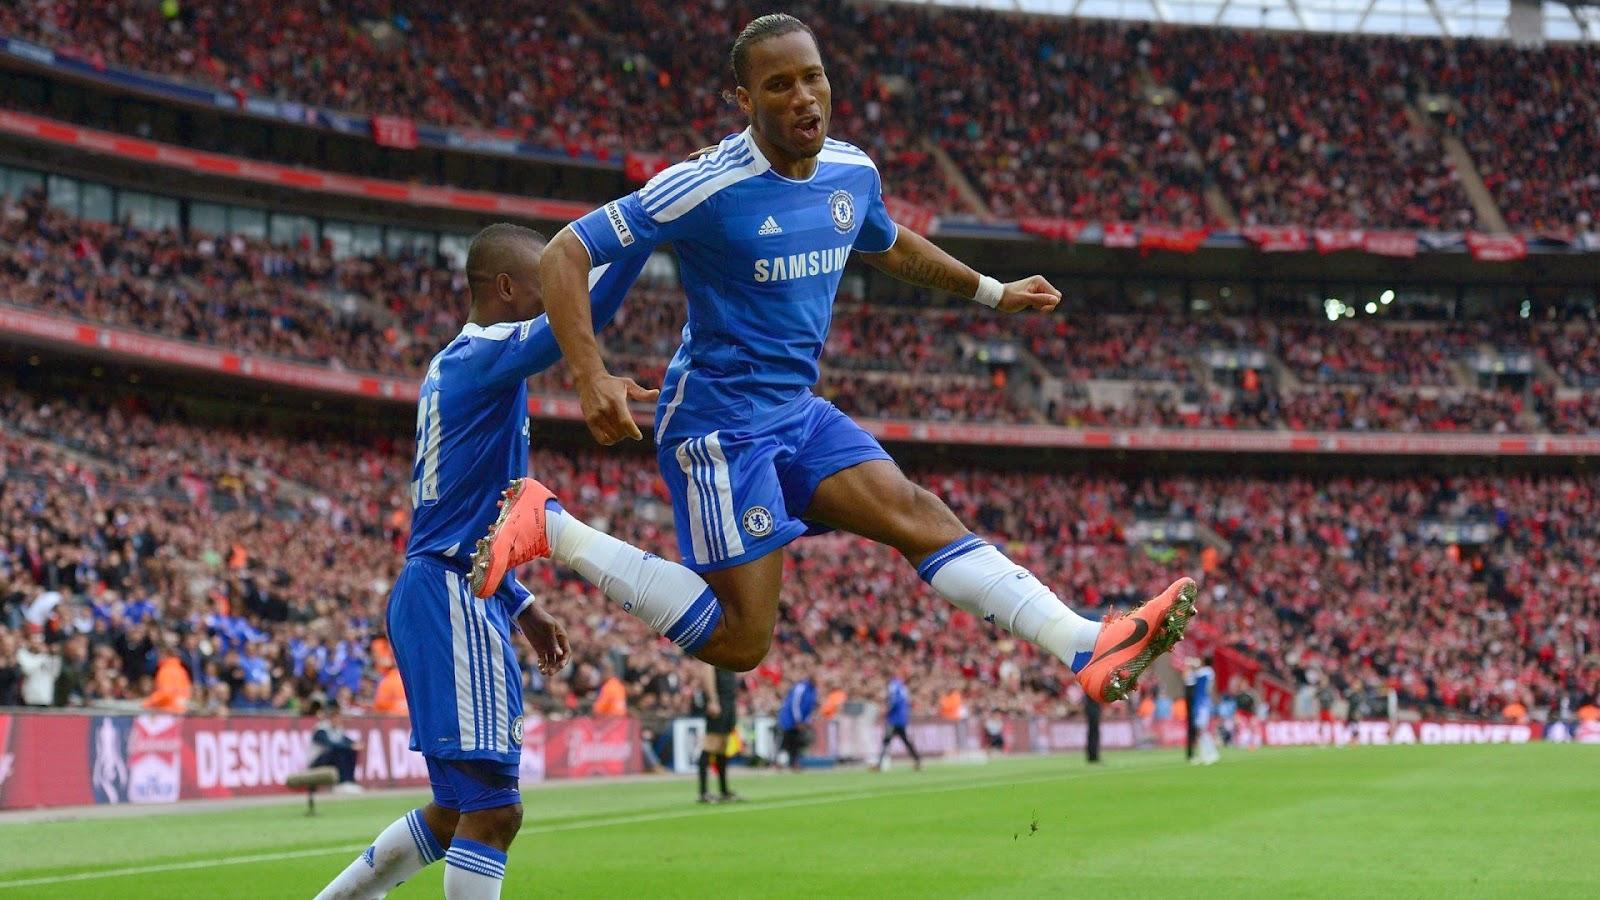 Chelsea FC drogba jump